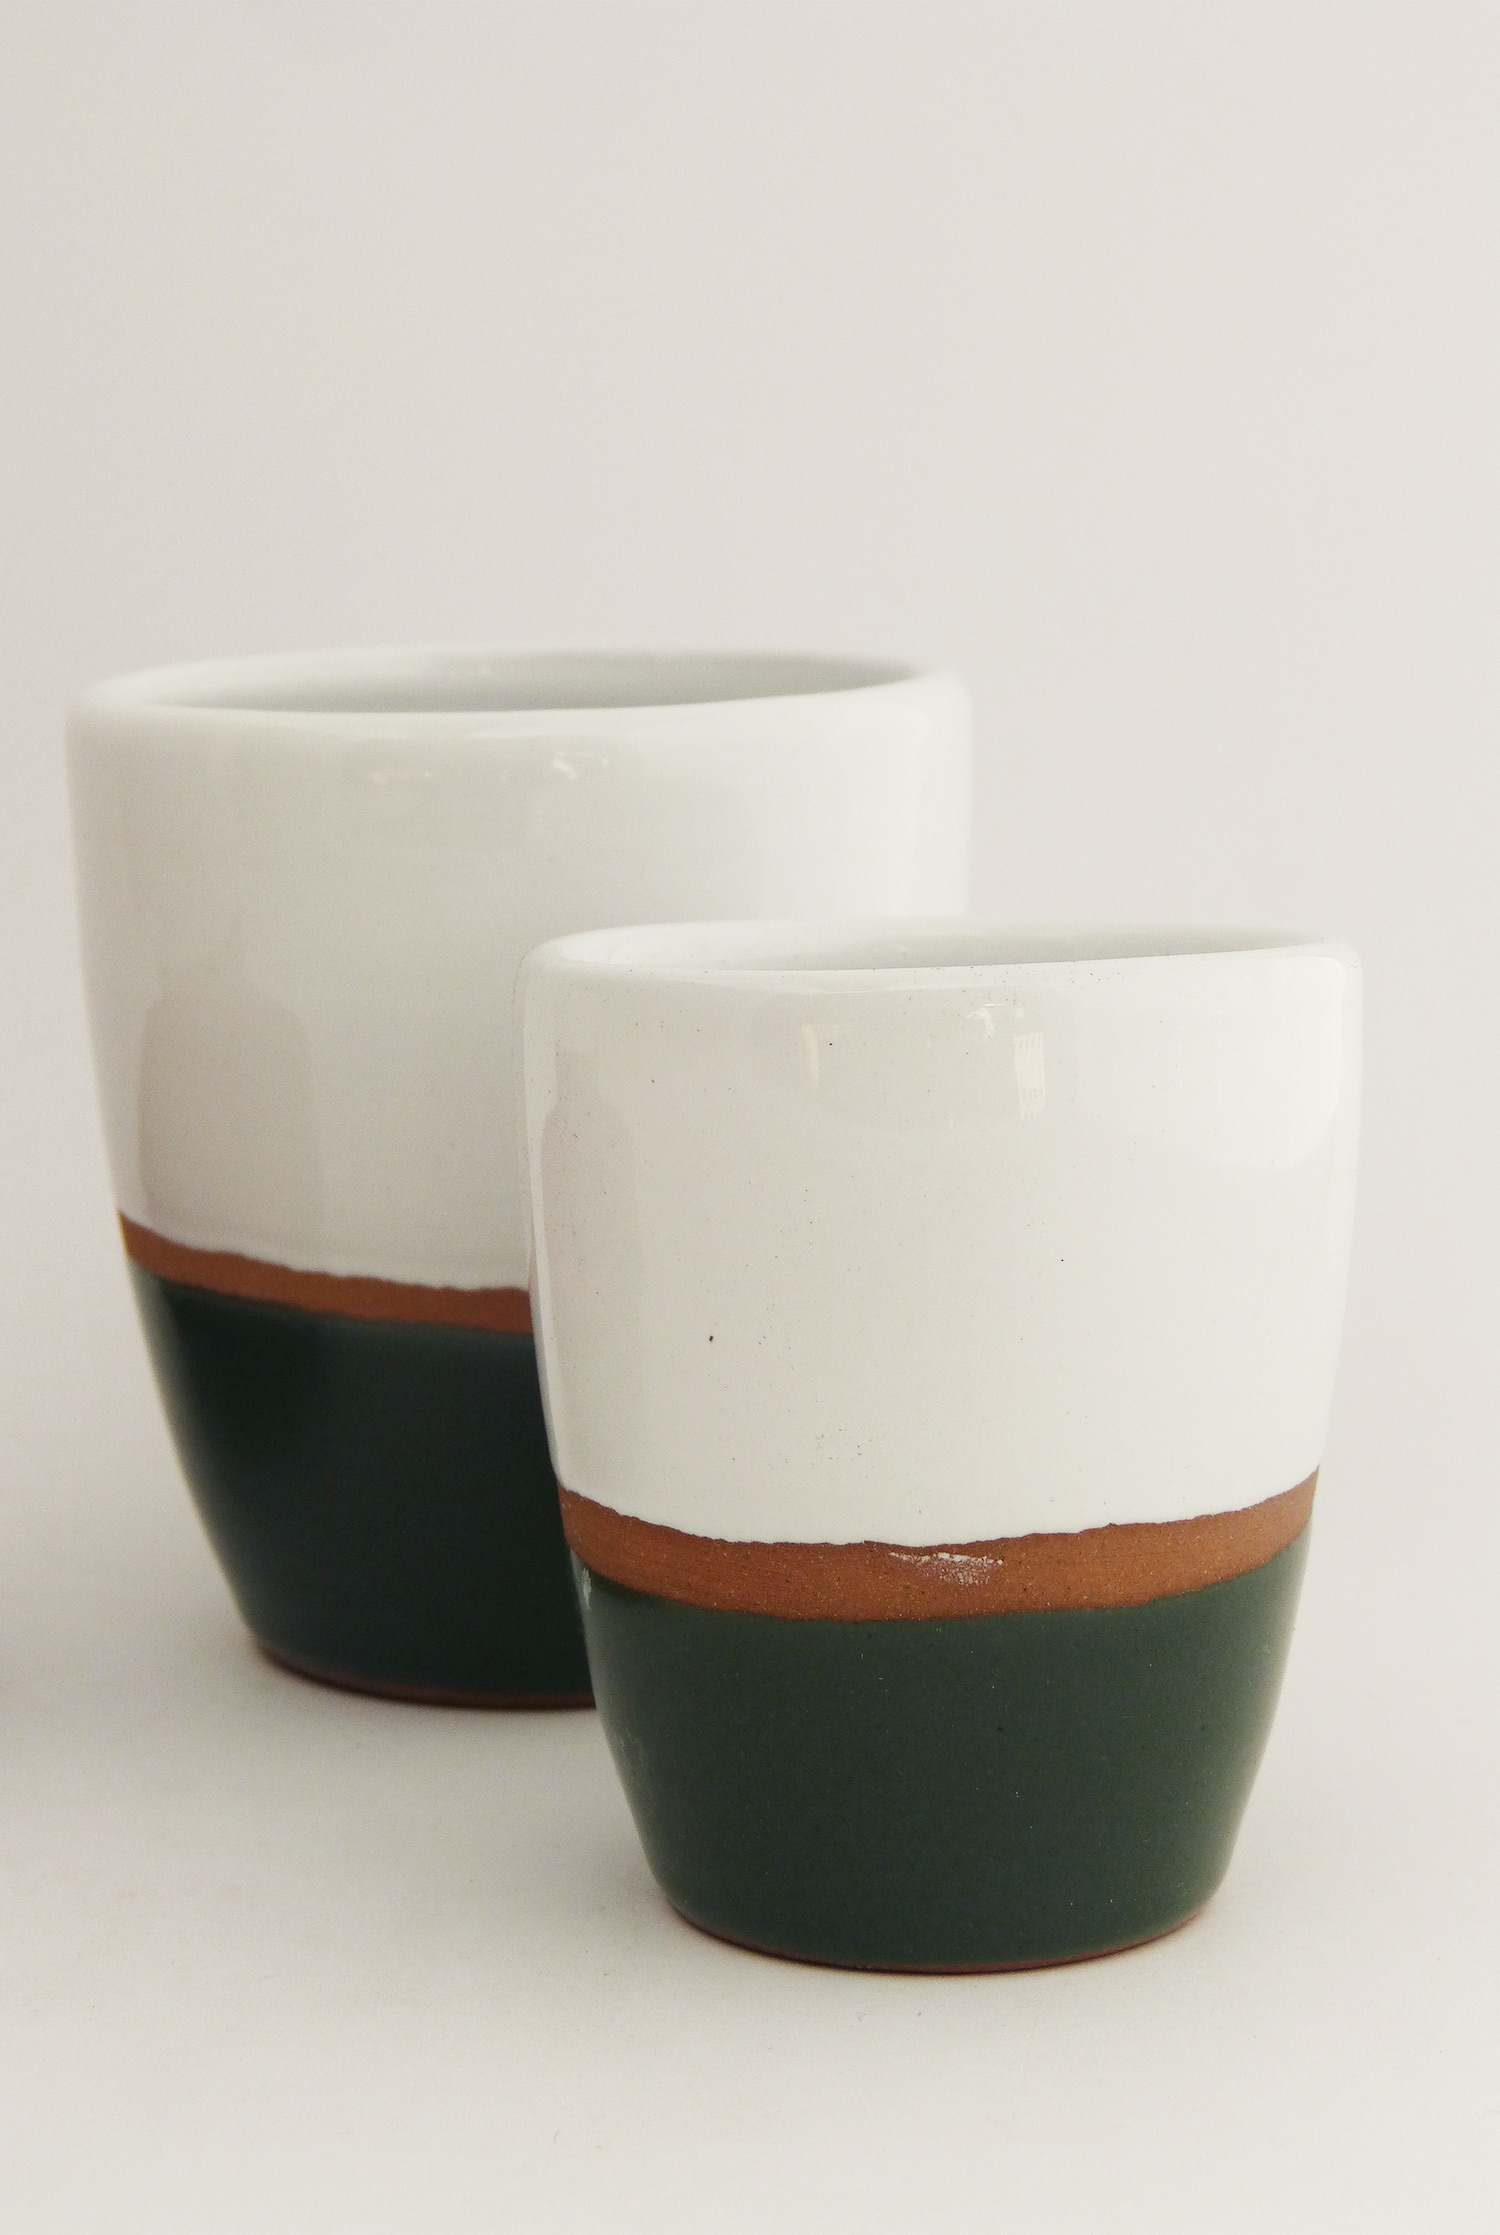 Tasse lungo terracotta couleur vert - Atsonios Sifnos